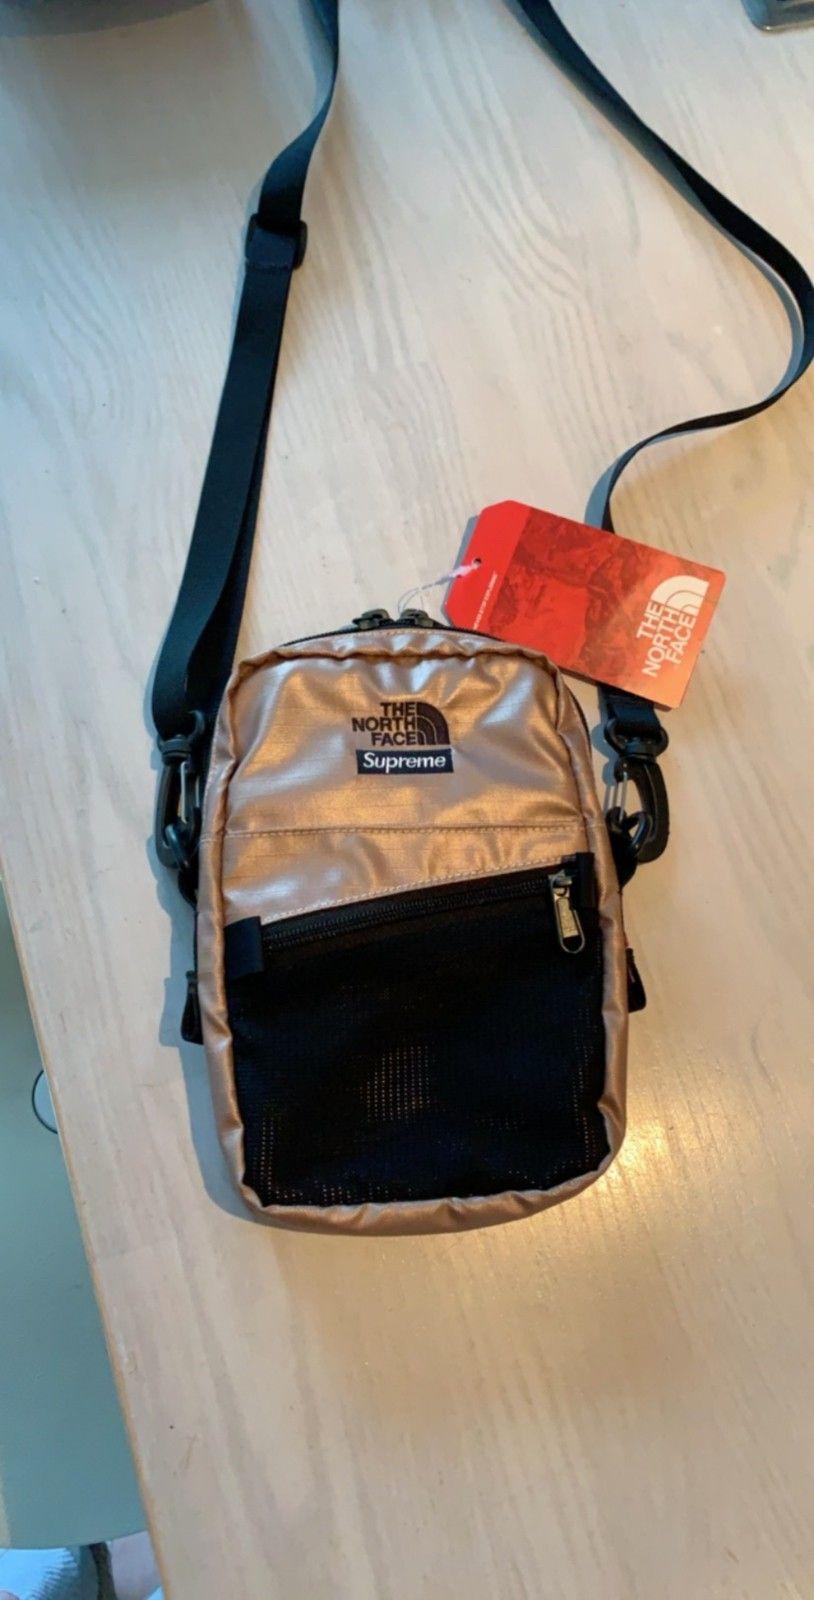 0fd03195 Supreme x The North Face metallic shoulder bag rose gold | FINN.no